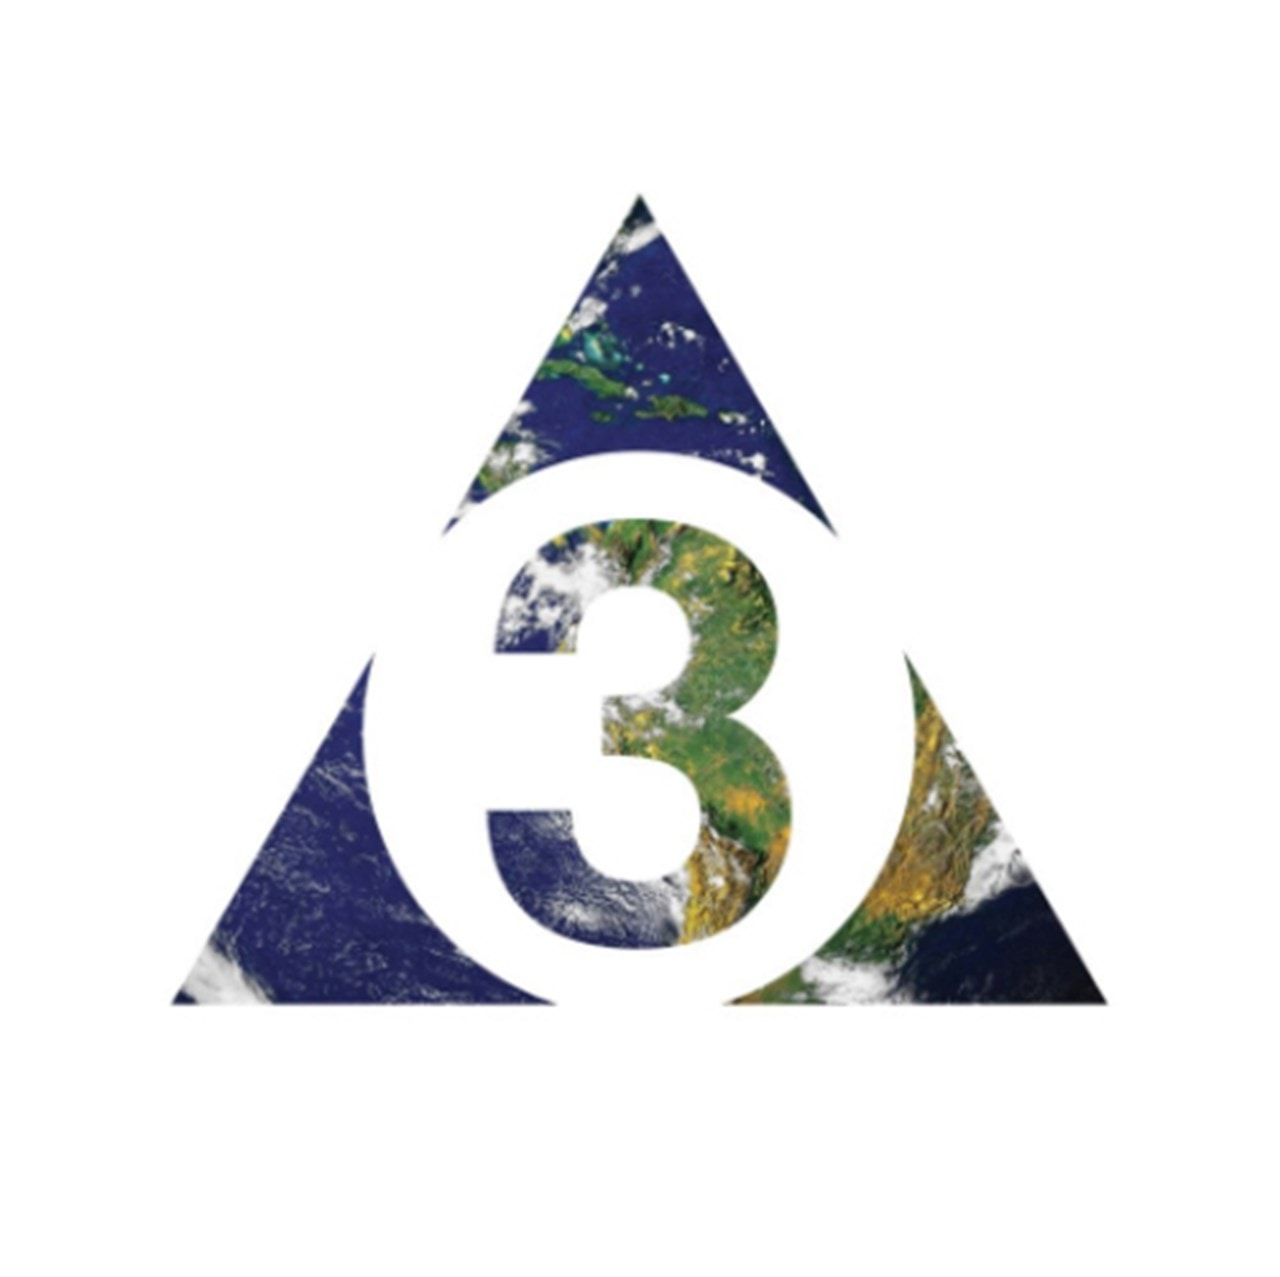 Third World Pyramid - 1